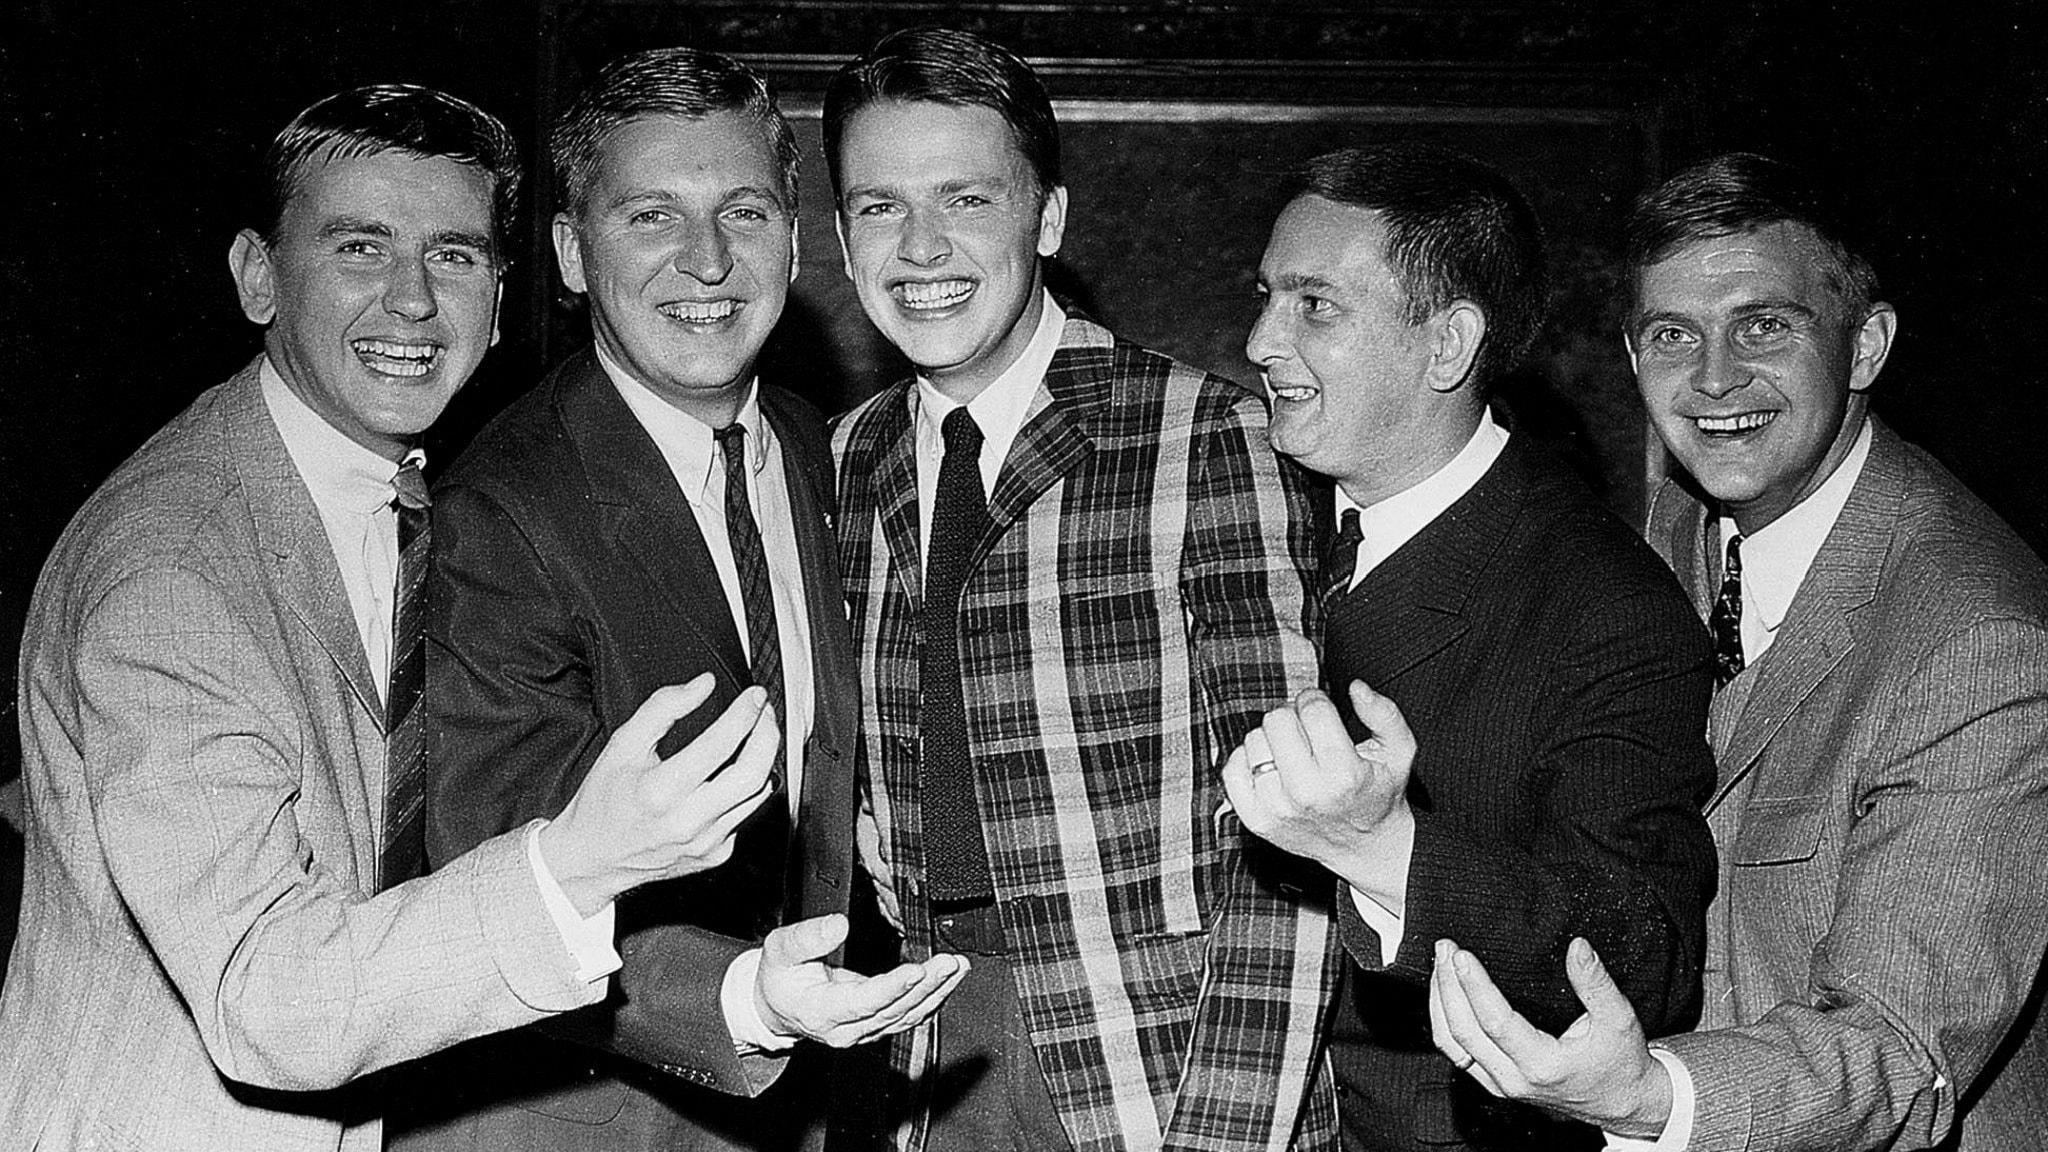 The Lovin' Spoonful hade 3 hits på Kvällstoppen 23 augusti 1966